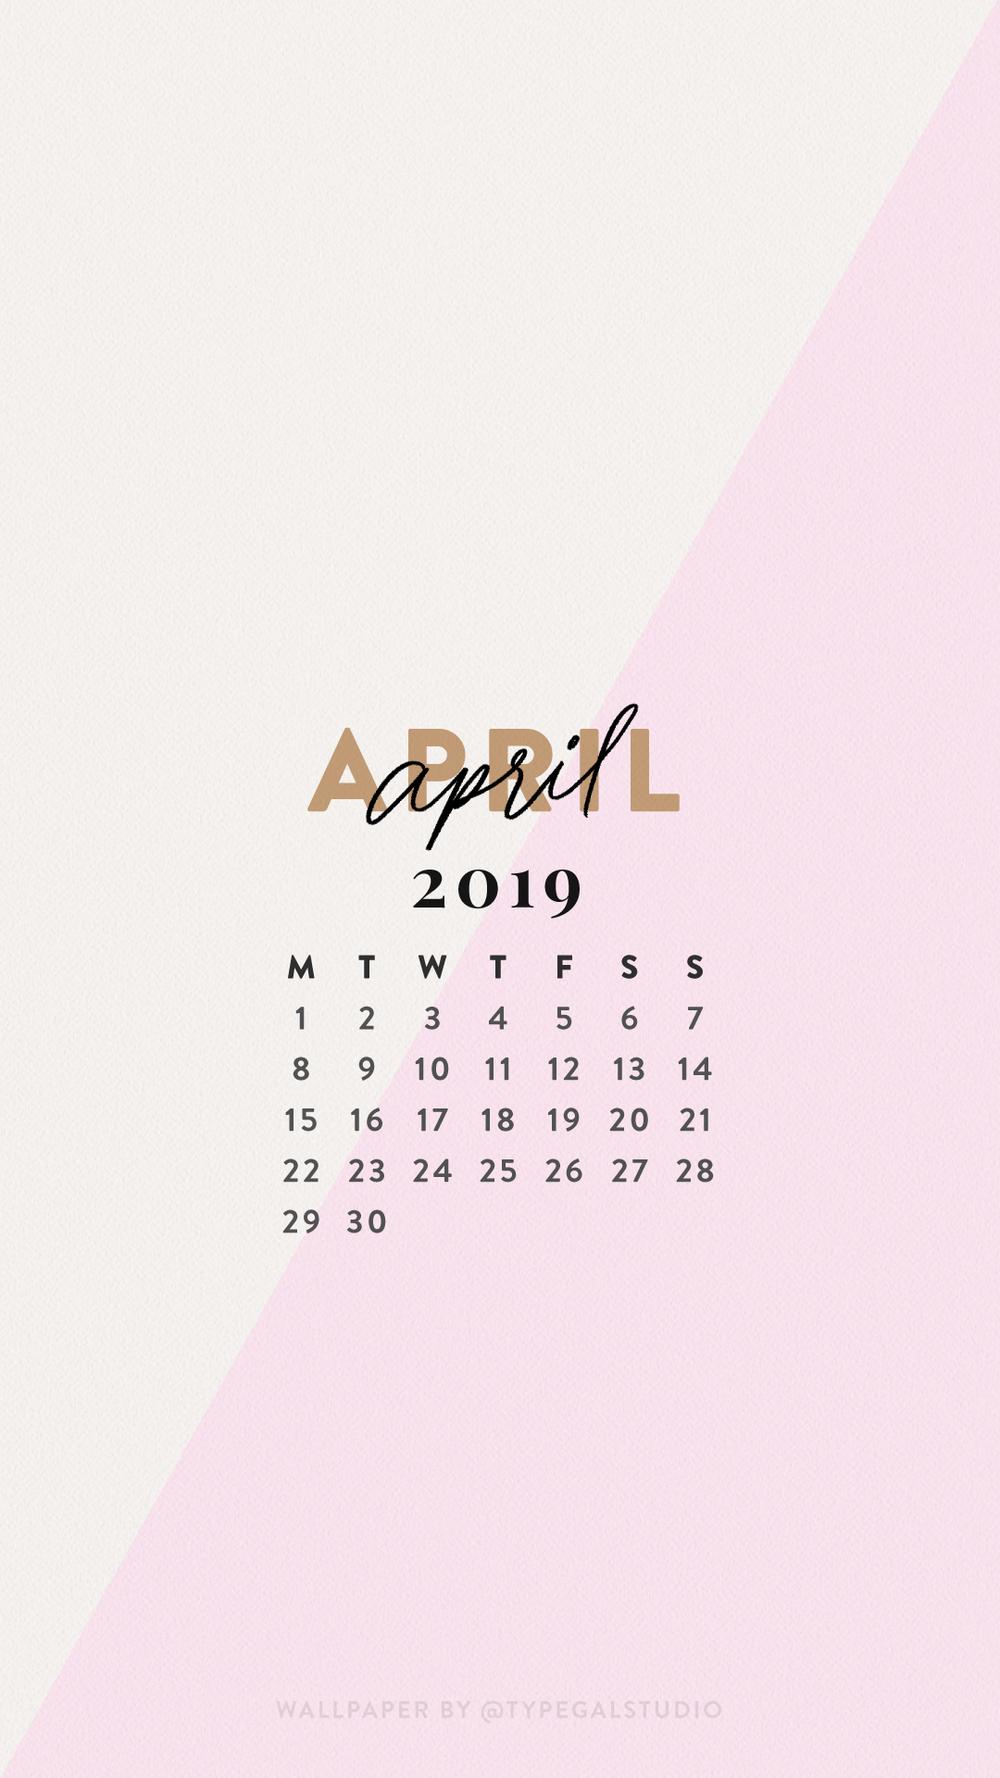 april-2019-wallpaper.png